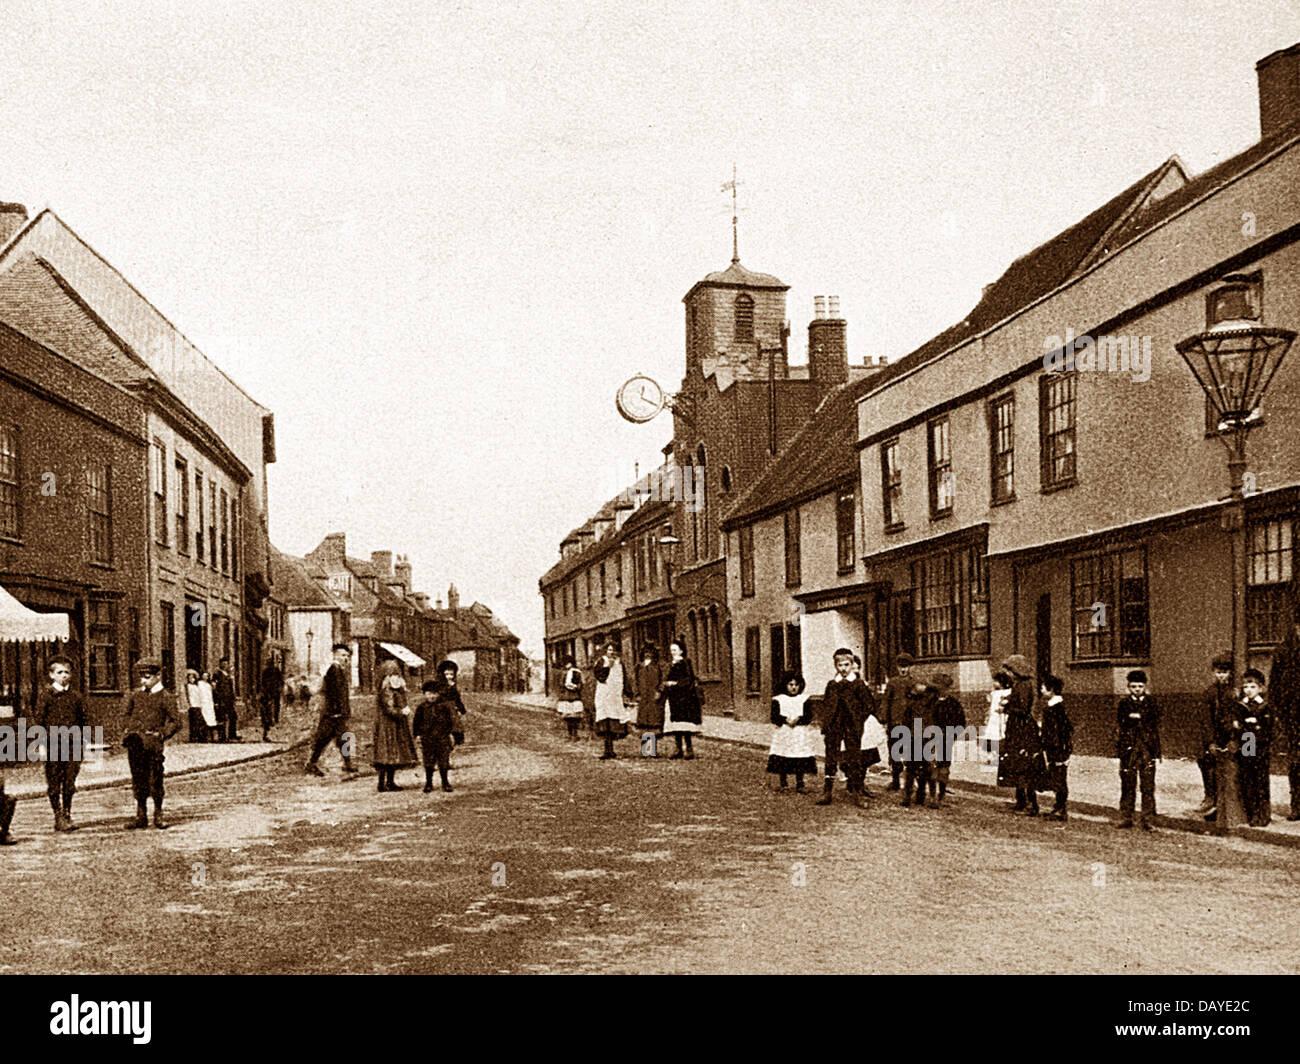 Milton High Street early 1900s - Stock Image